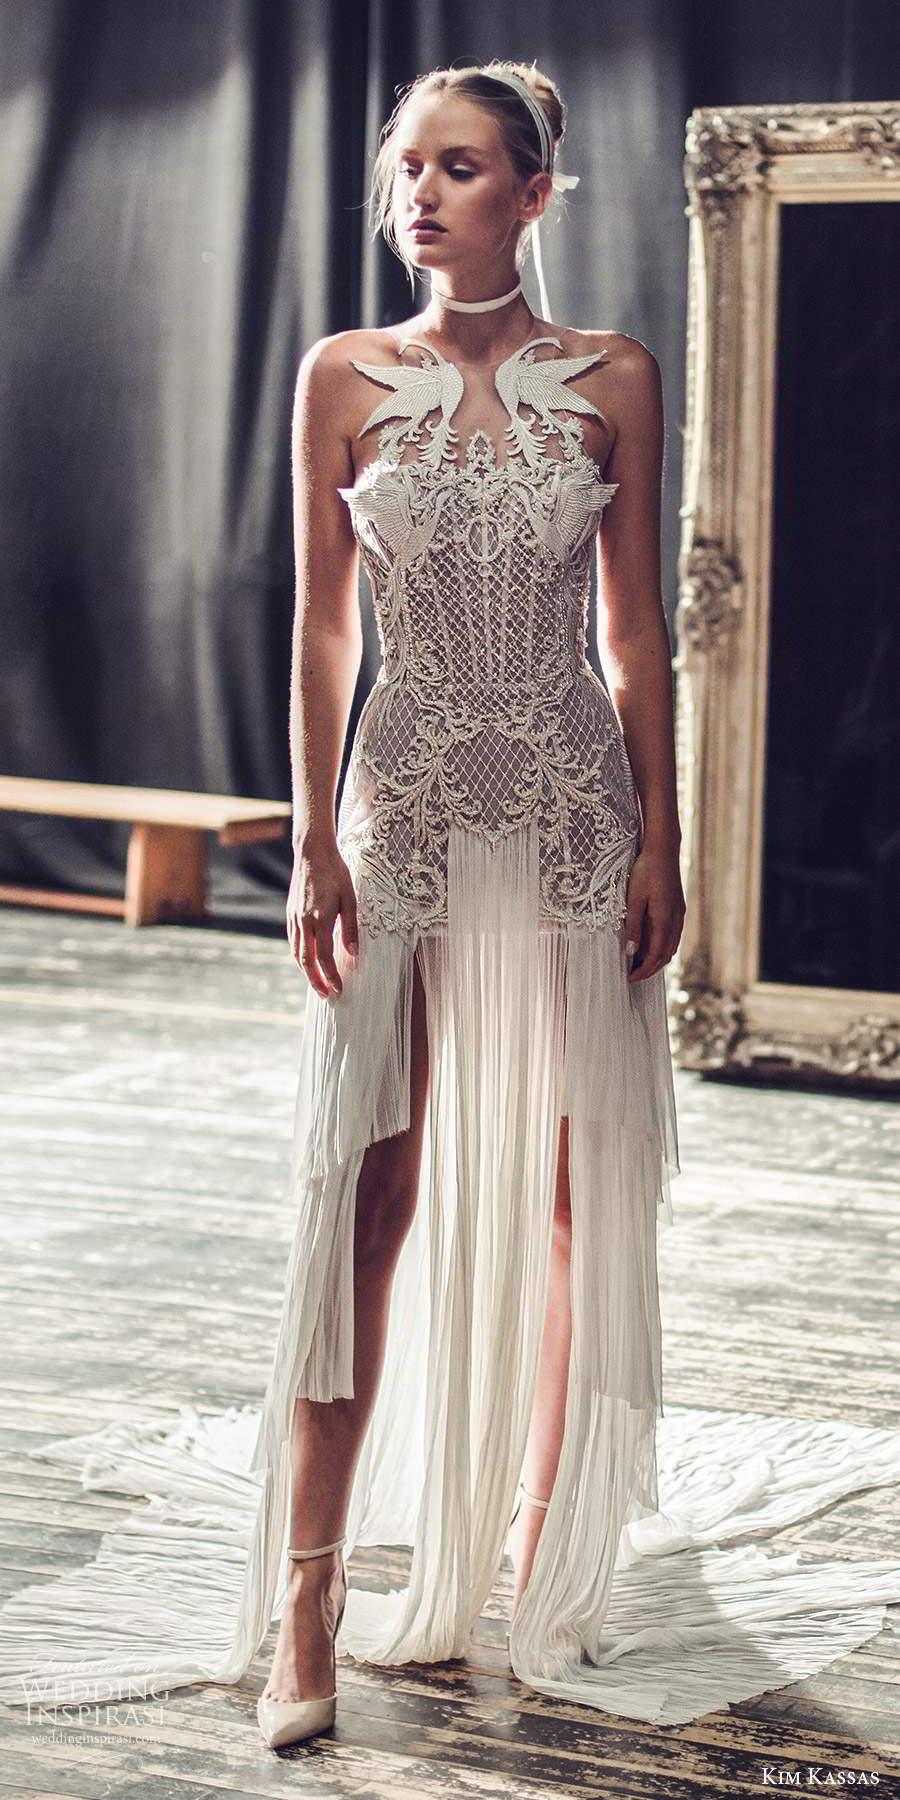 kim kassas fall 2021 bridal sleeveless high neckline heavile embellished bodice column wedding dress chapel train open back (1) mv